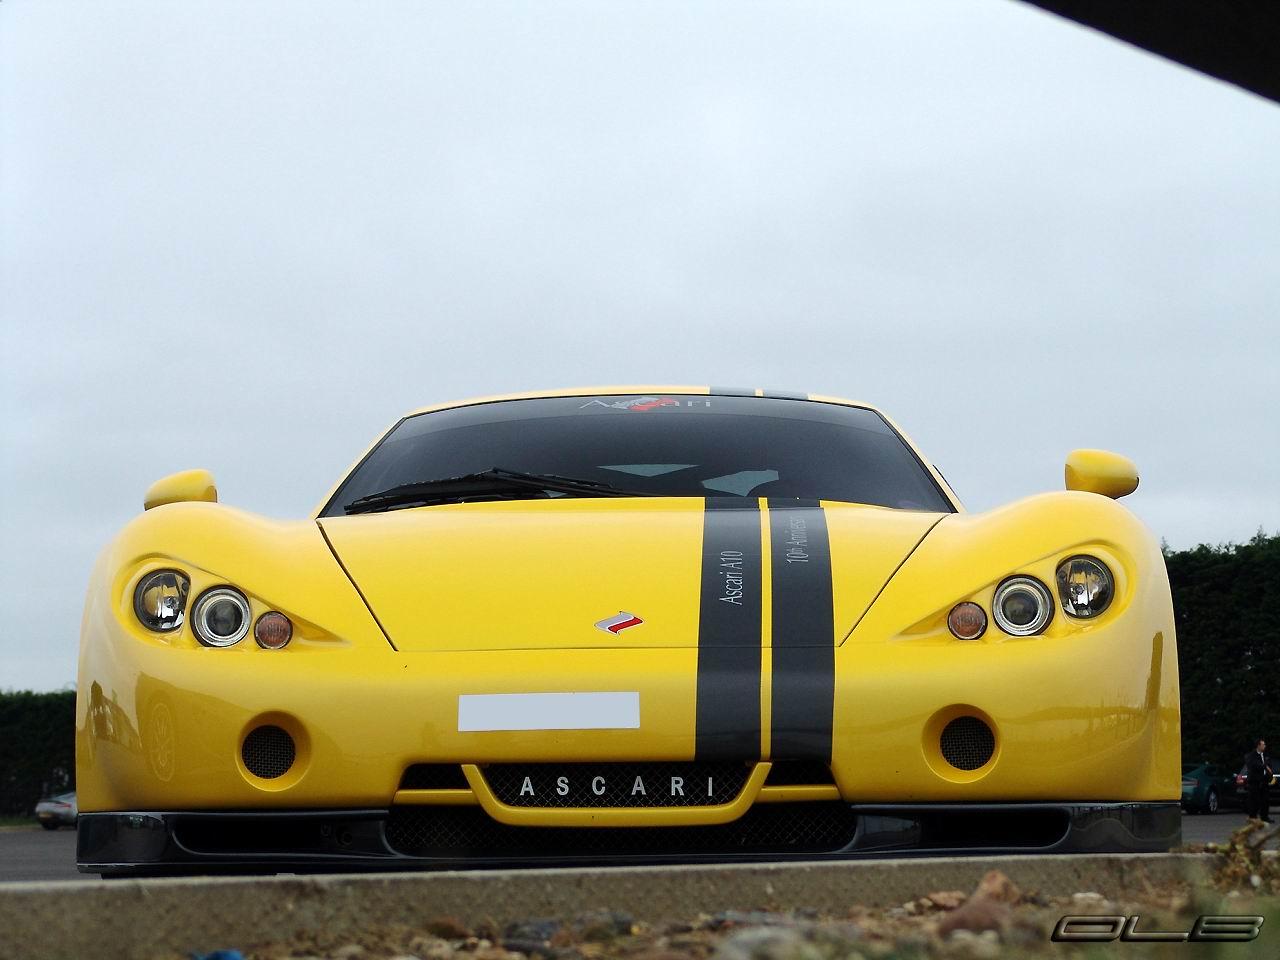 2006 Ascari A10 Prototype